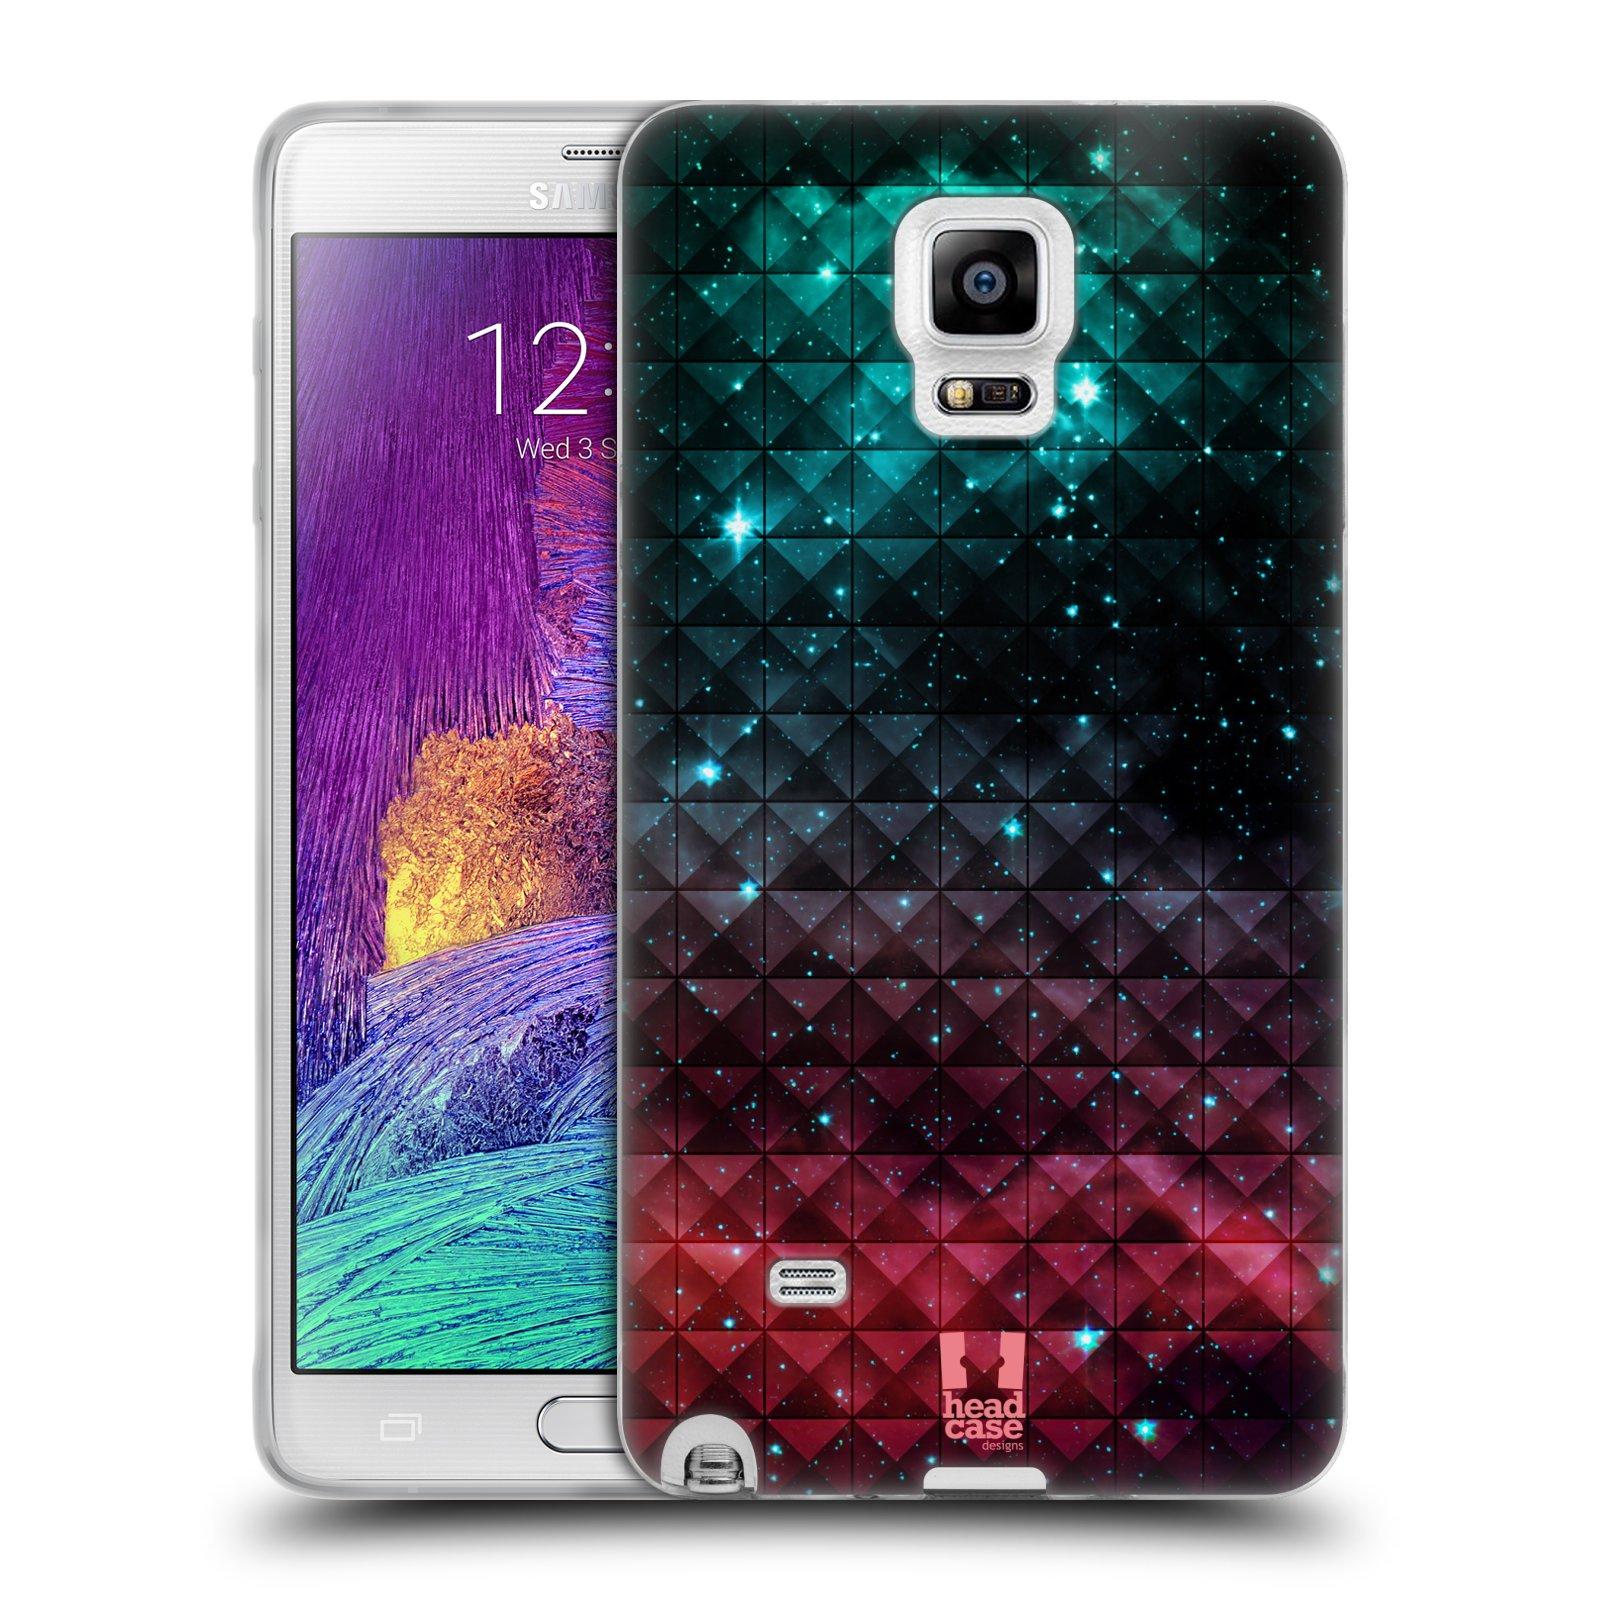 HEAD CASE silikonový obal na mobil Samsung Galaxy Note 4 (N910) vzor Hvězdná obloha hvězdy a slunce RUDÁ A MODRÁ